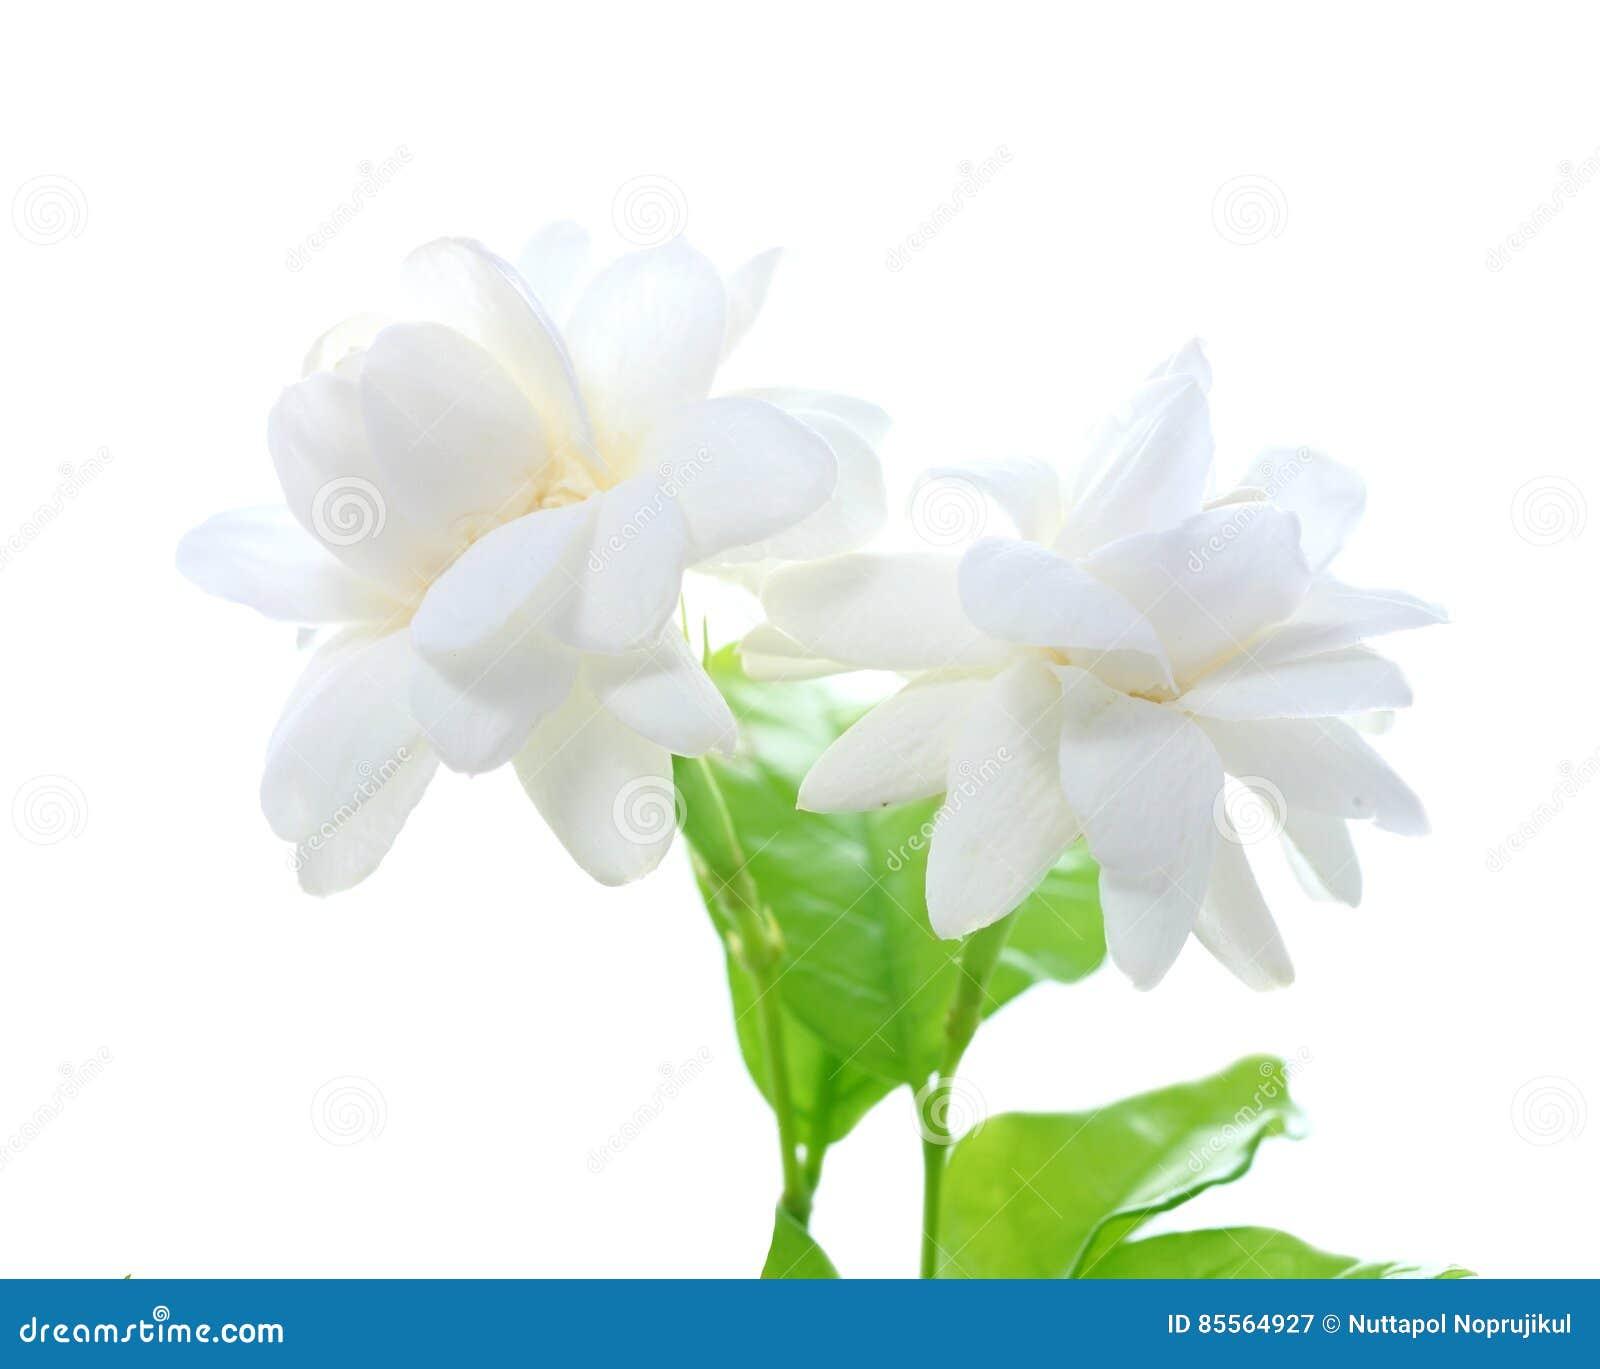 Jasmine flower on white background stock image image of gardenia royalty free stock photo izmirmasajfo Gallery